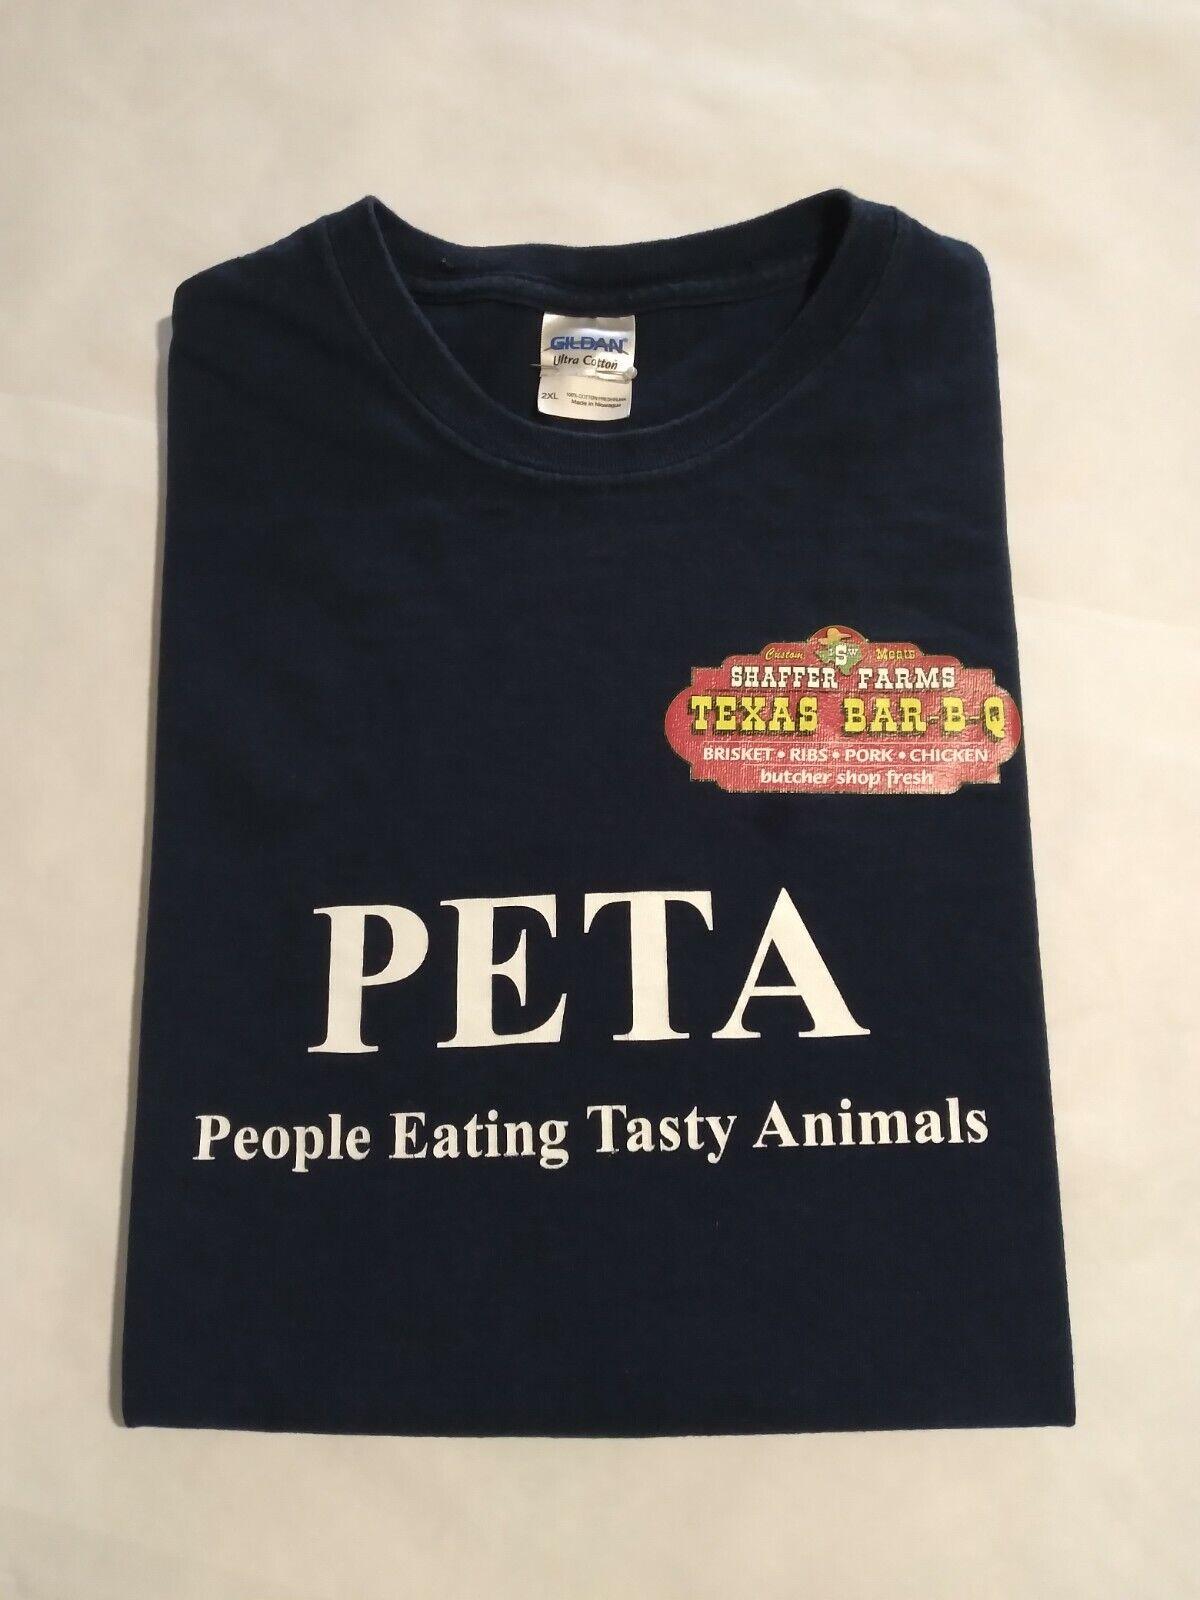 90's 2 HIT Shaffer Farms PETA Streetwear Navy 2X Crewneck Tshirt VintageOldStock